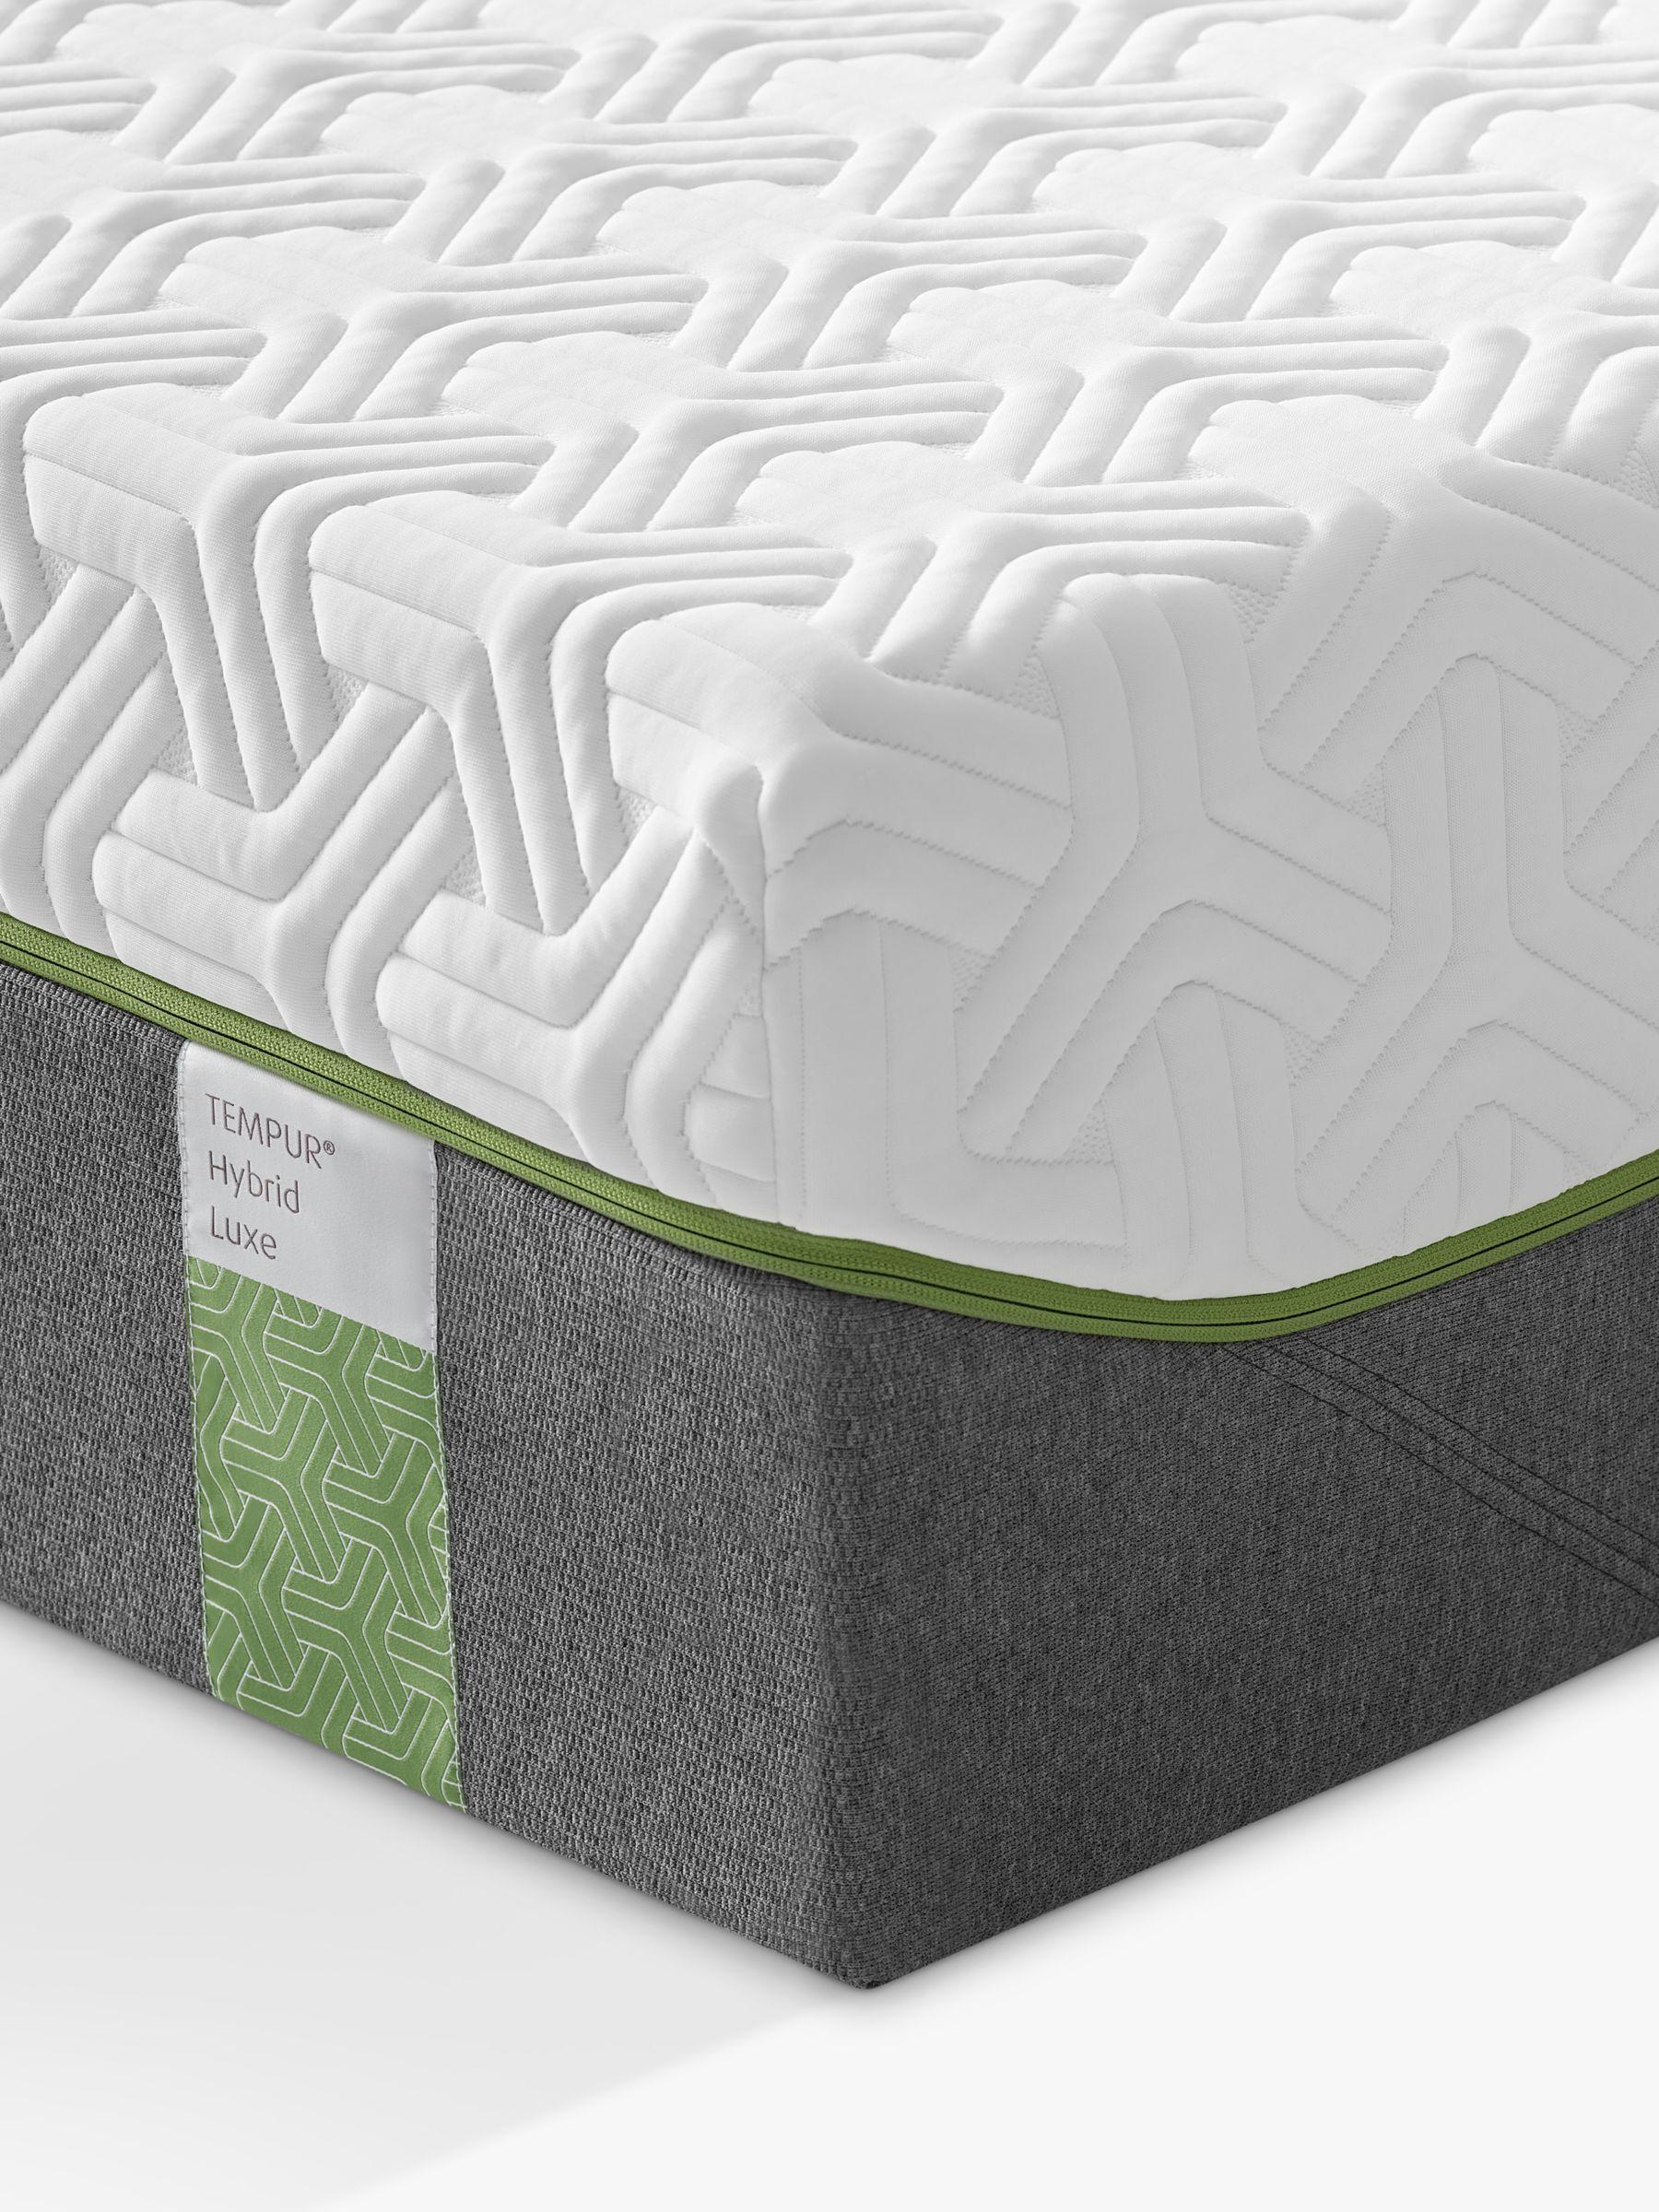 Tempur Tempur Hybrid Luxe Pocket Spring Memory Foam Mattress, Super King Size